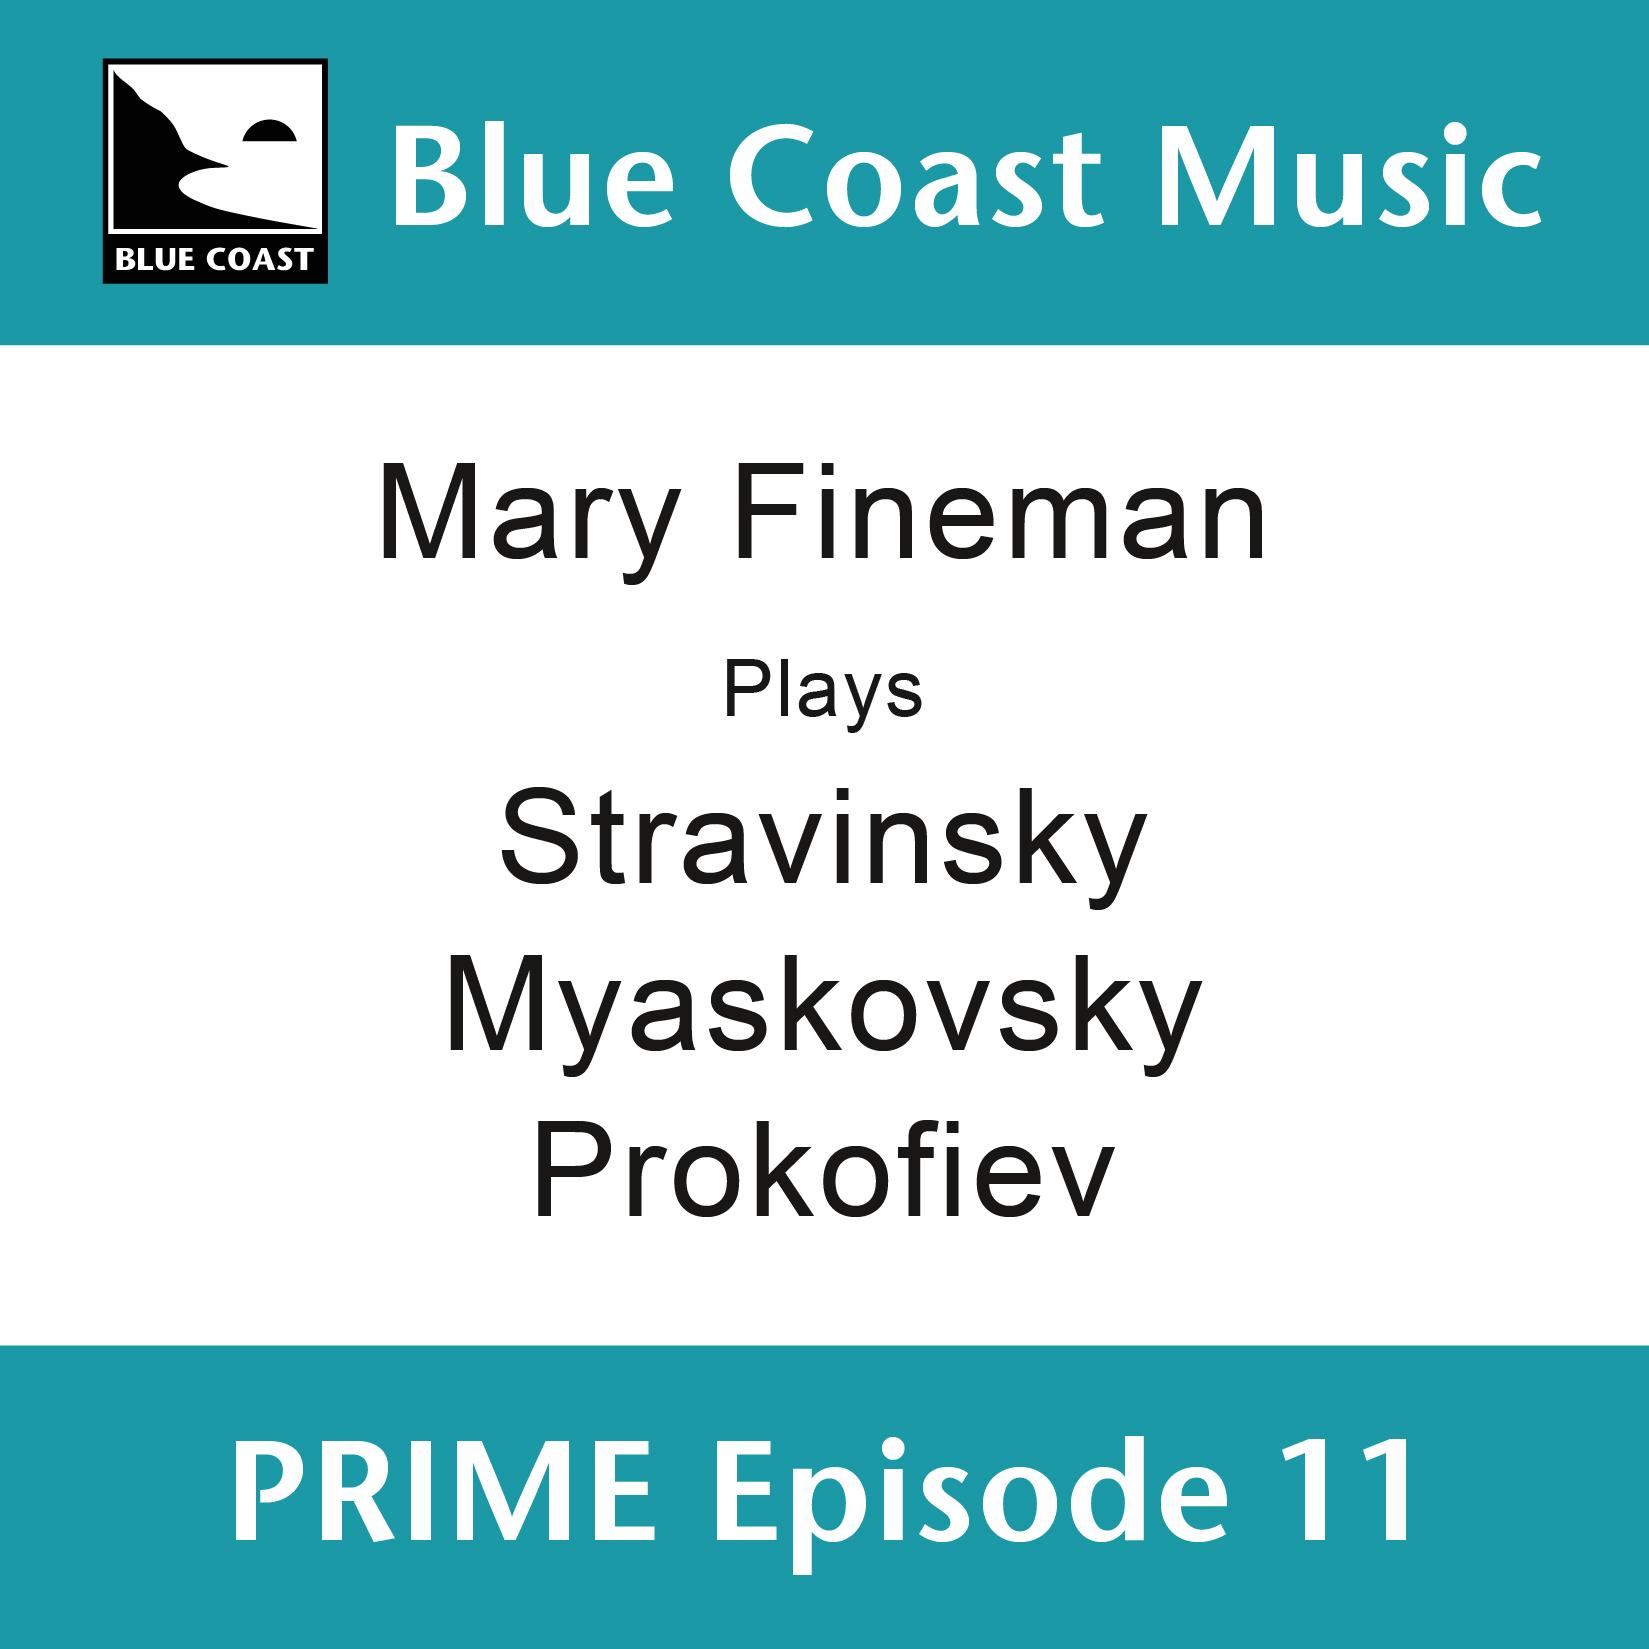 PRIME Episode 11 - Cover Image